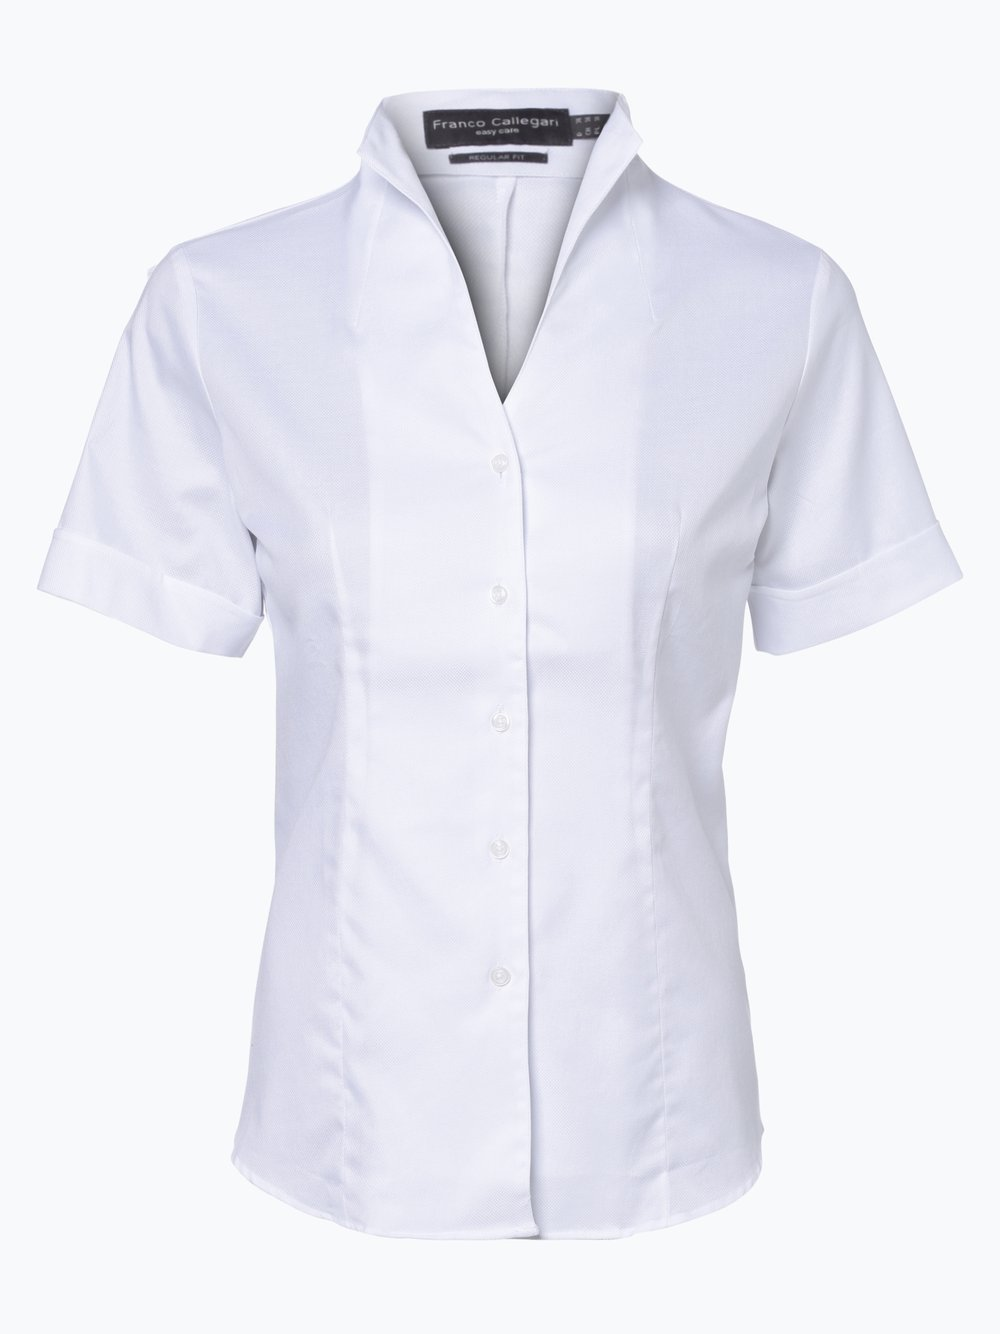 Franco Callegari – Bluzka damska, biały Van Graaf 311223-0021